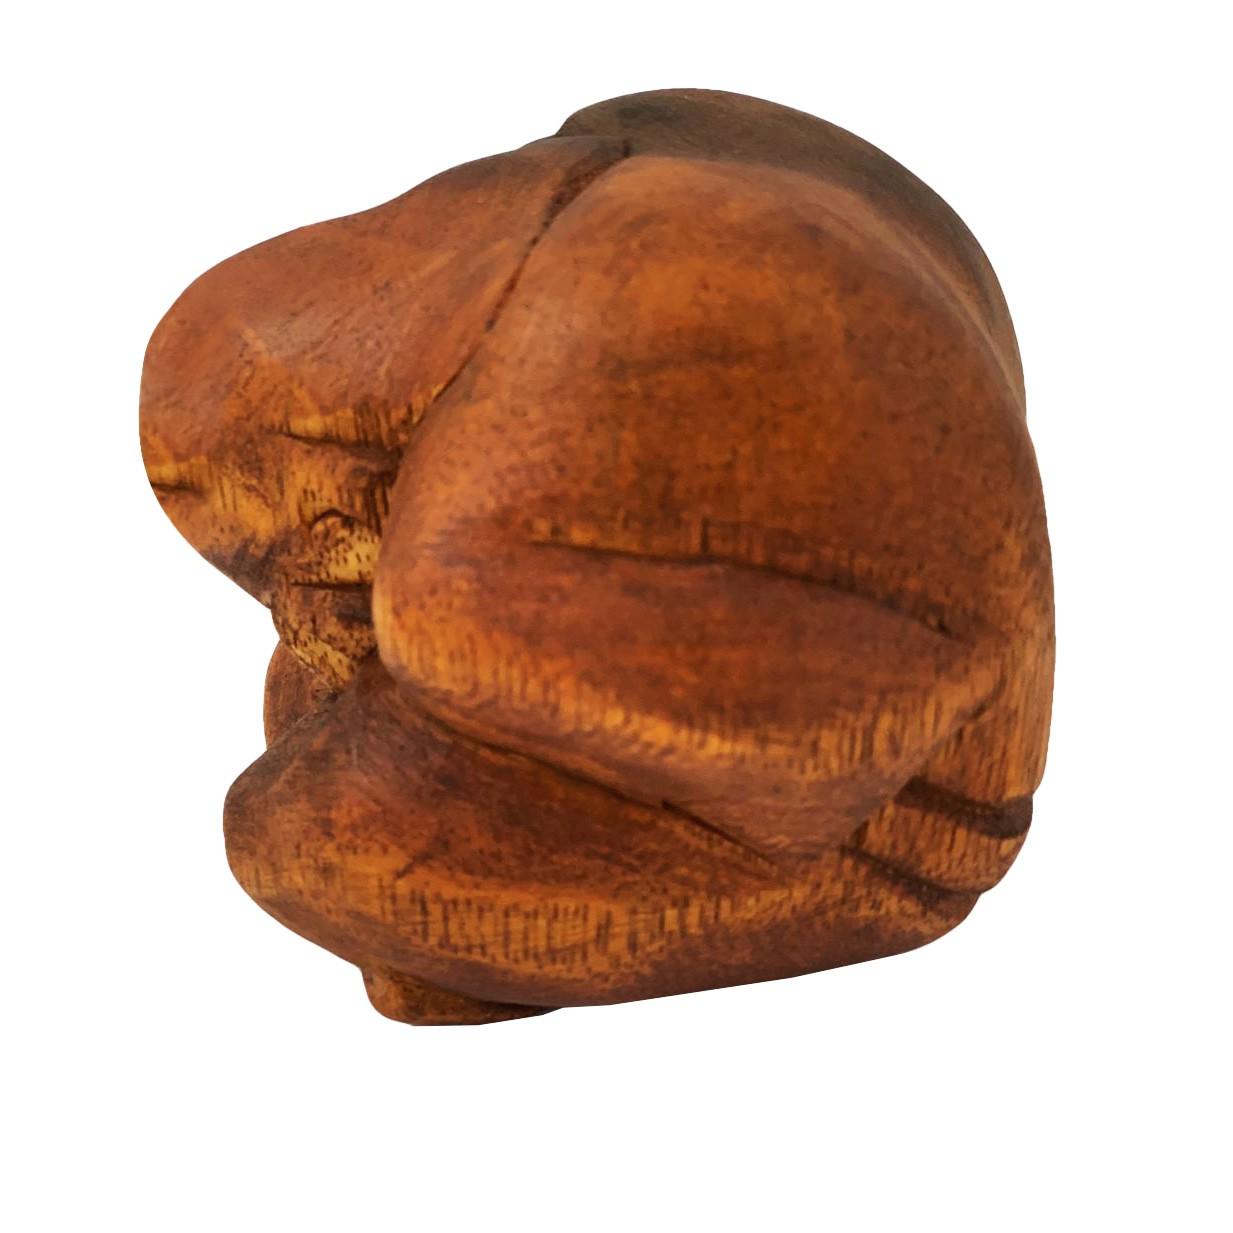 Esculturas Monge Yogi Encolhido ( 10 cm )